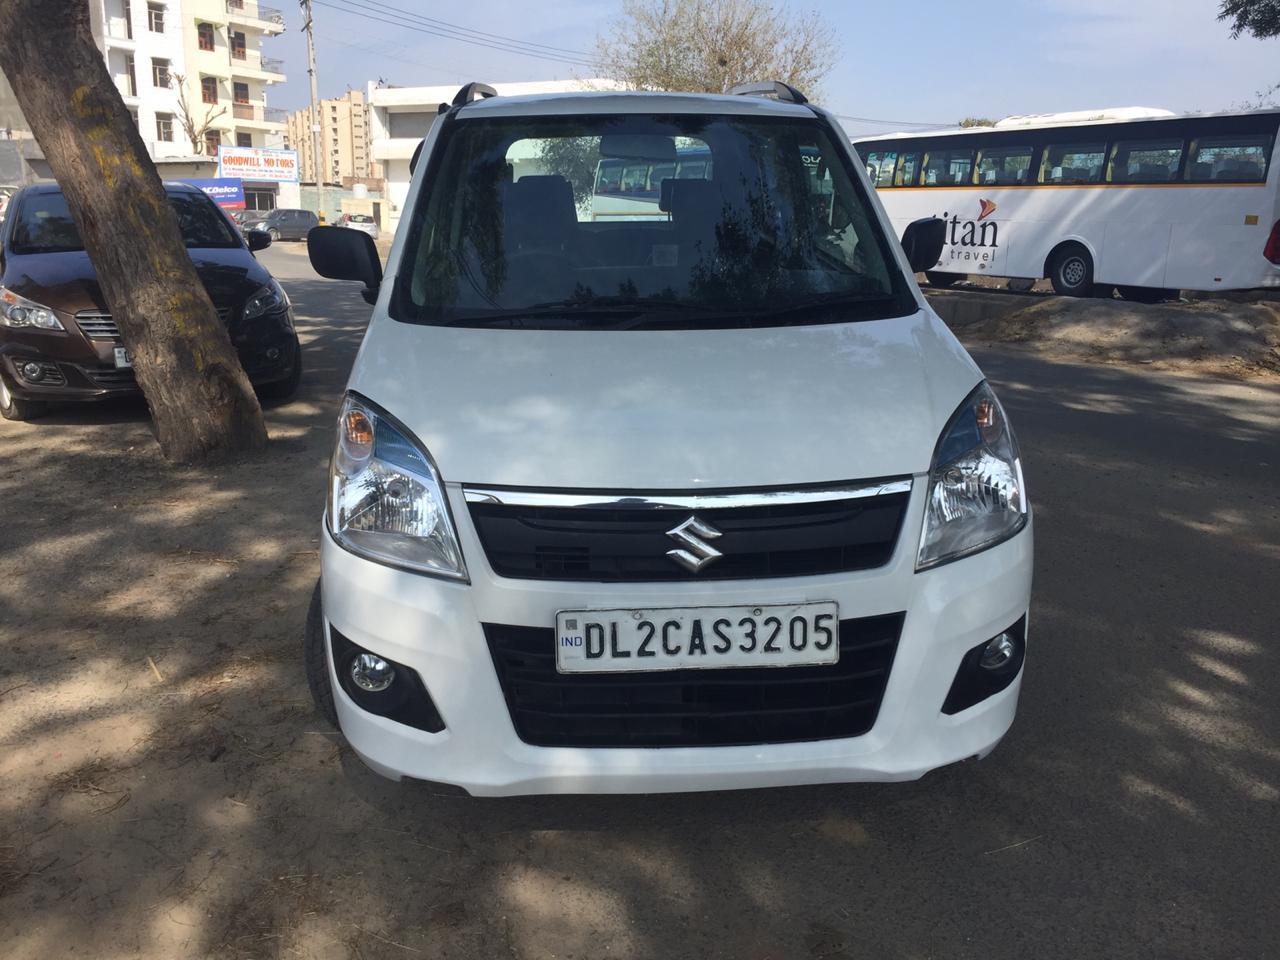 Used Wagon-R-Lxi-CNG Maruti in Delhi